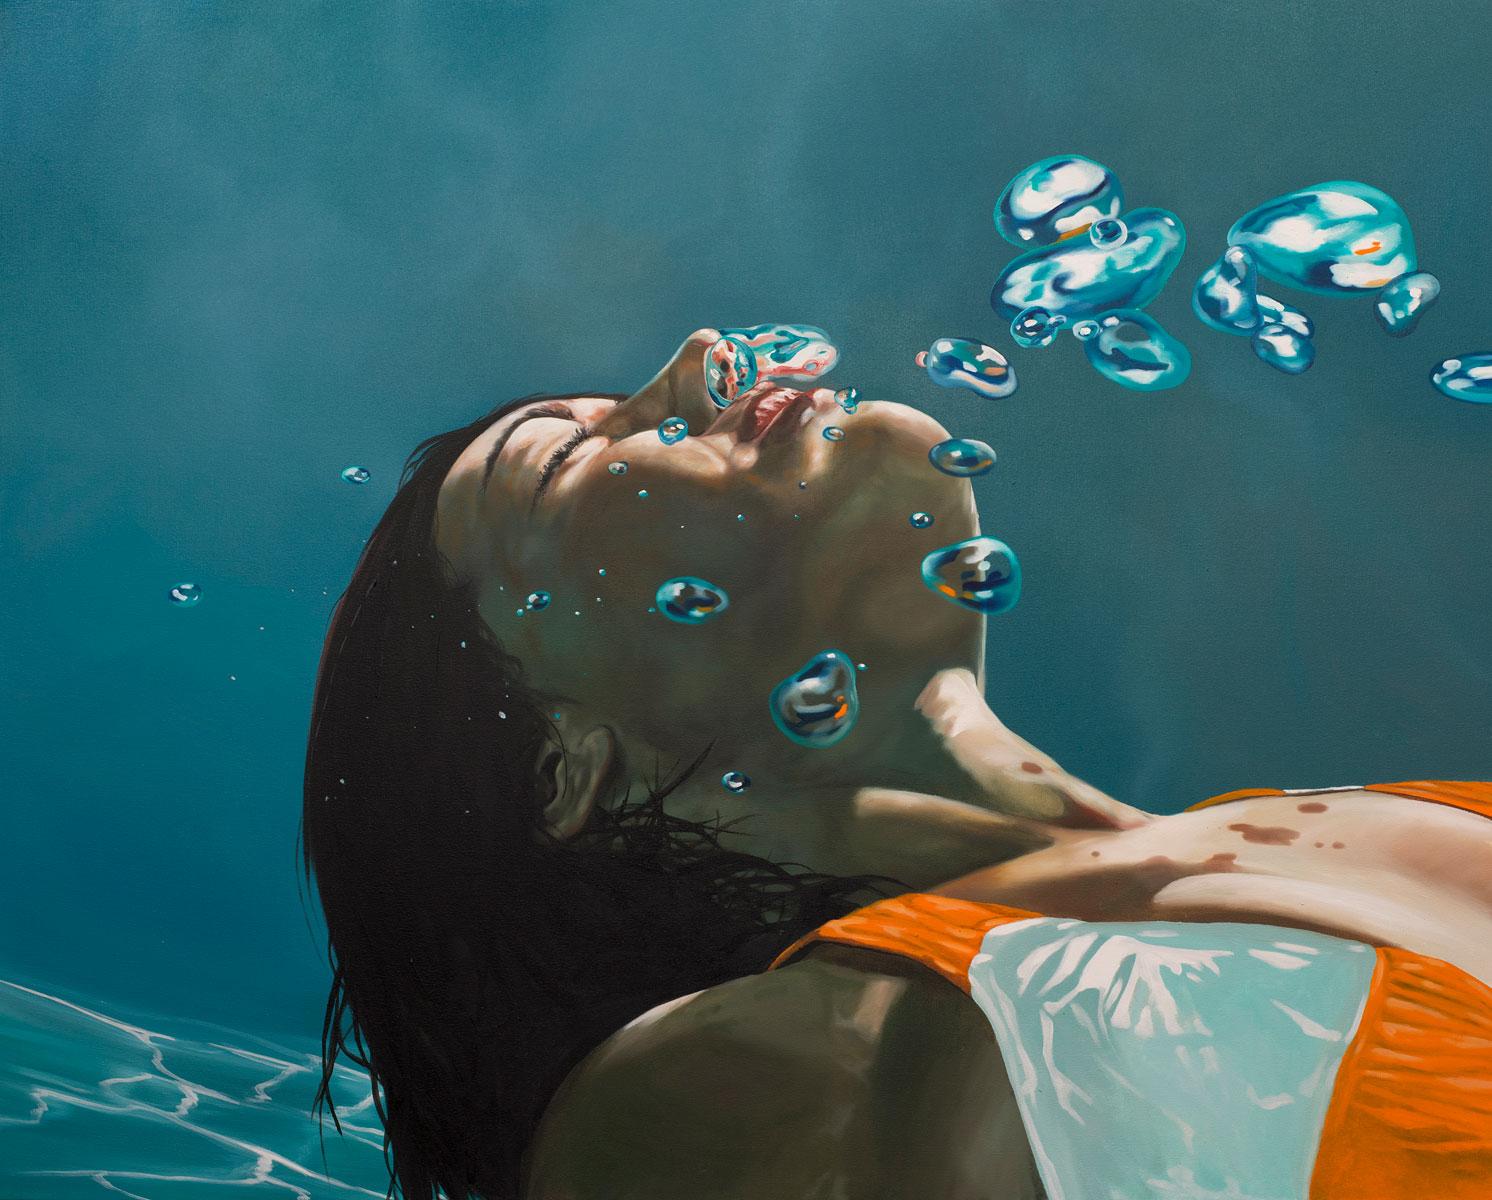 underwater painting of people by houston - 736×591